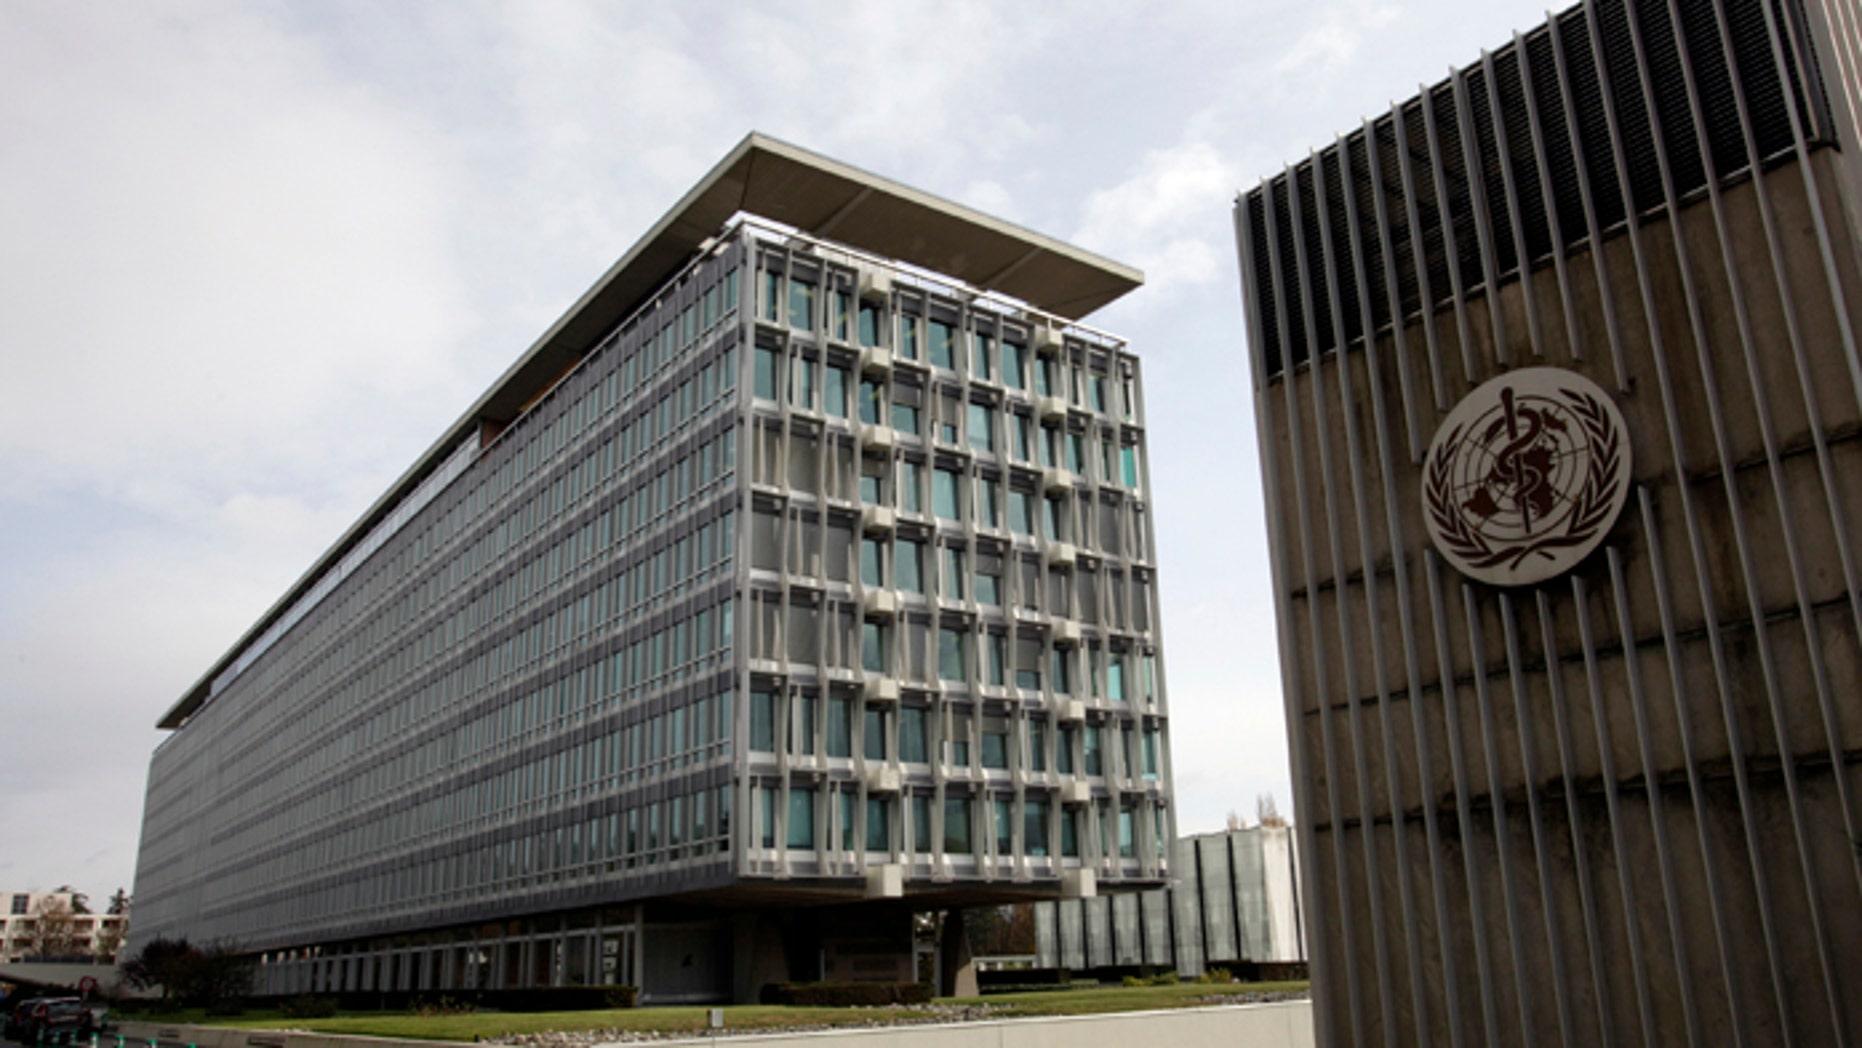 The World Health Organization (WHO) headquarters is seen in Geneva.